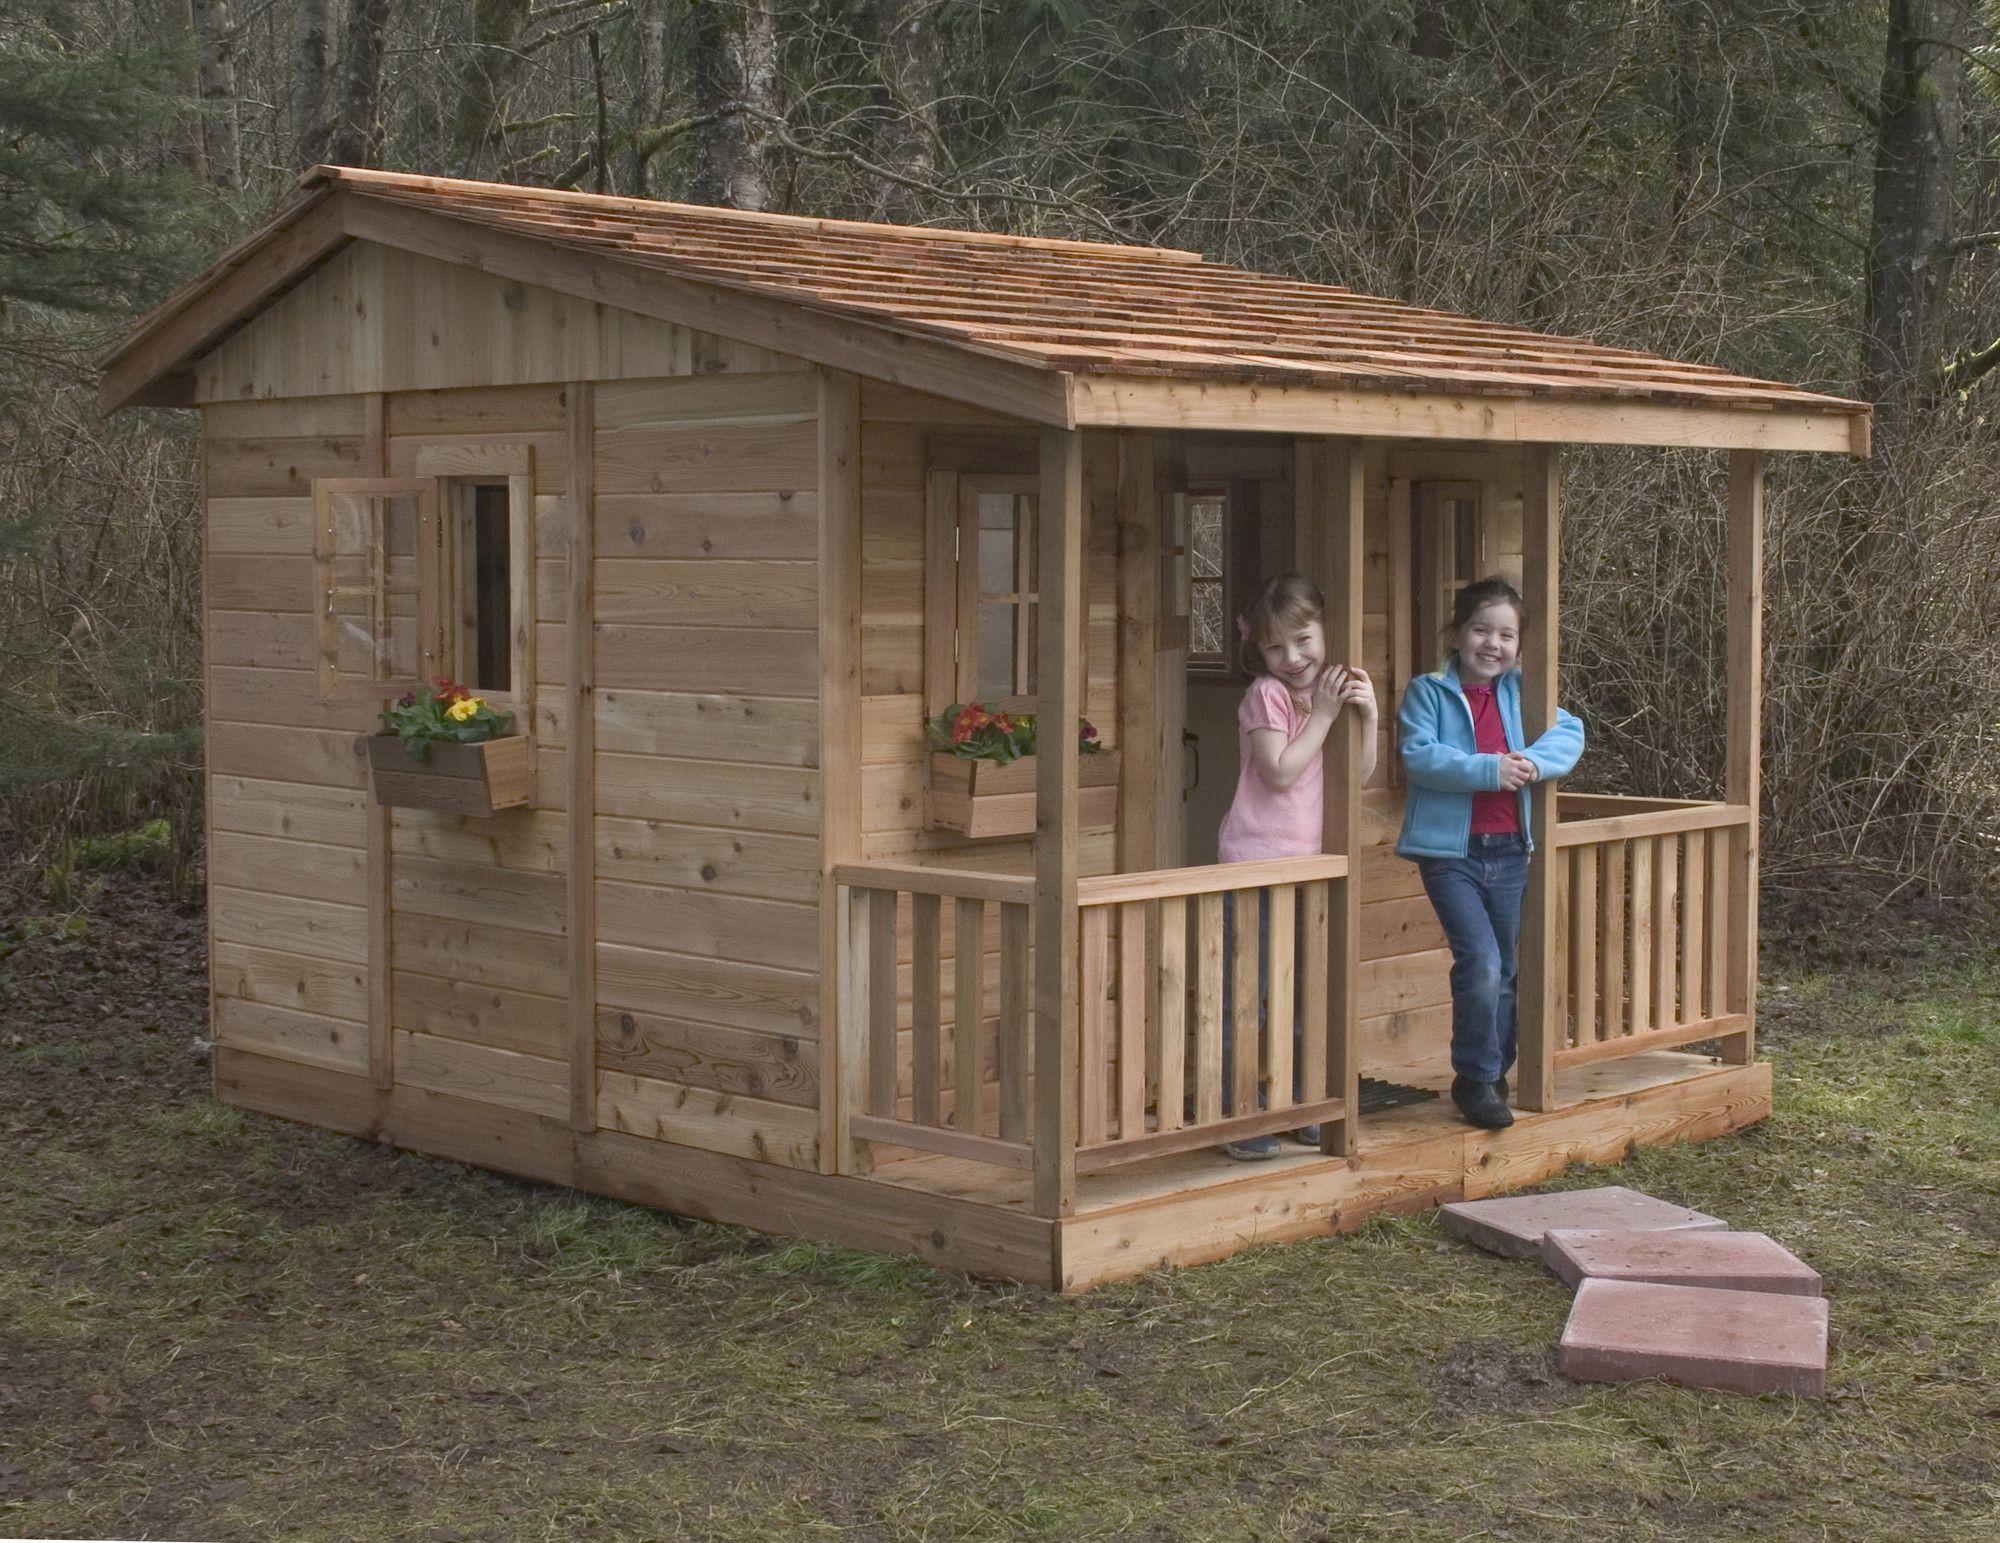 Cozy Cabin 9' X 7' Cedar Playhouse Backyard Pallet